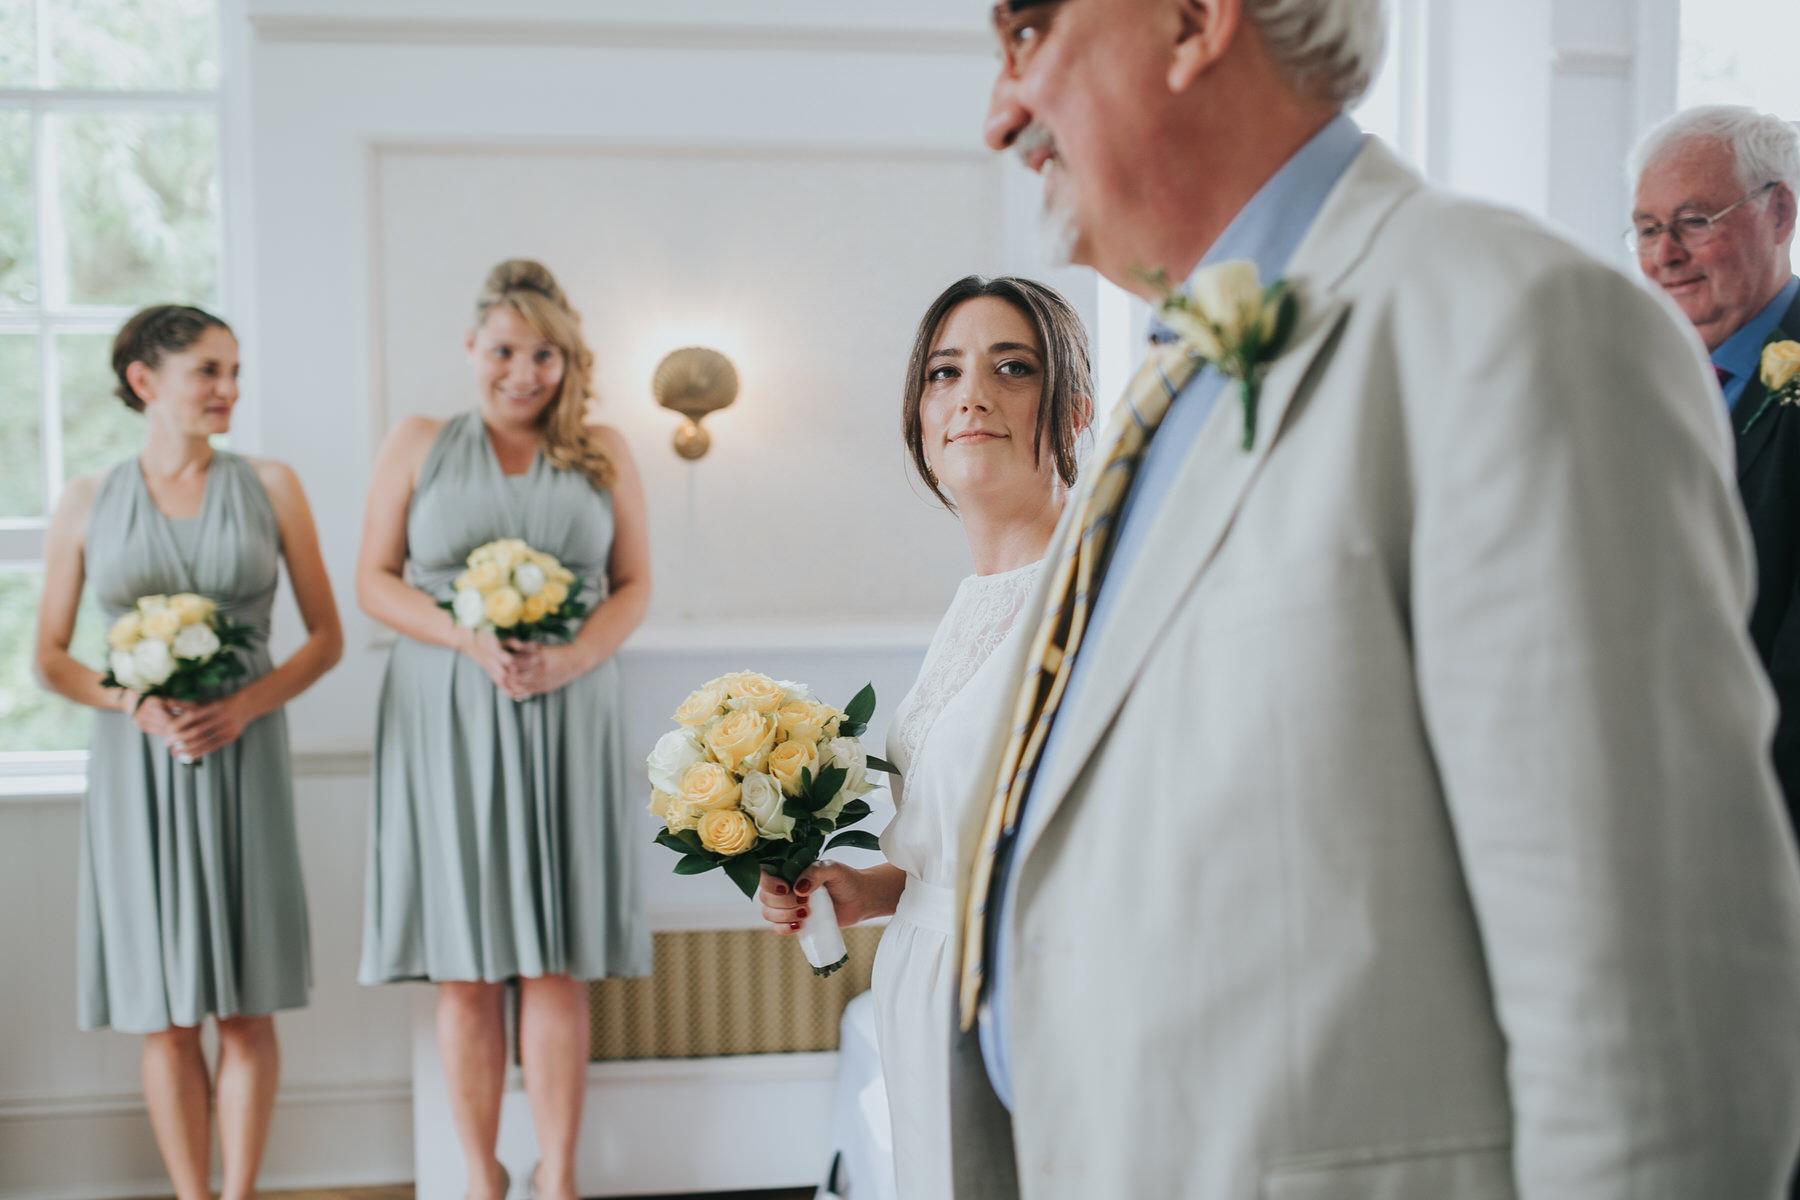 89 bride glances at dad Belair House wedding ceremony.jpg